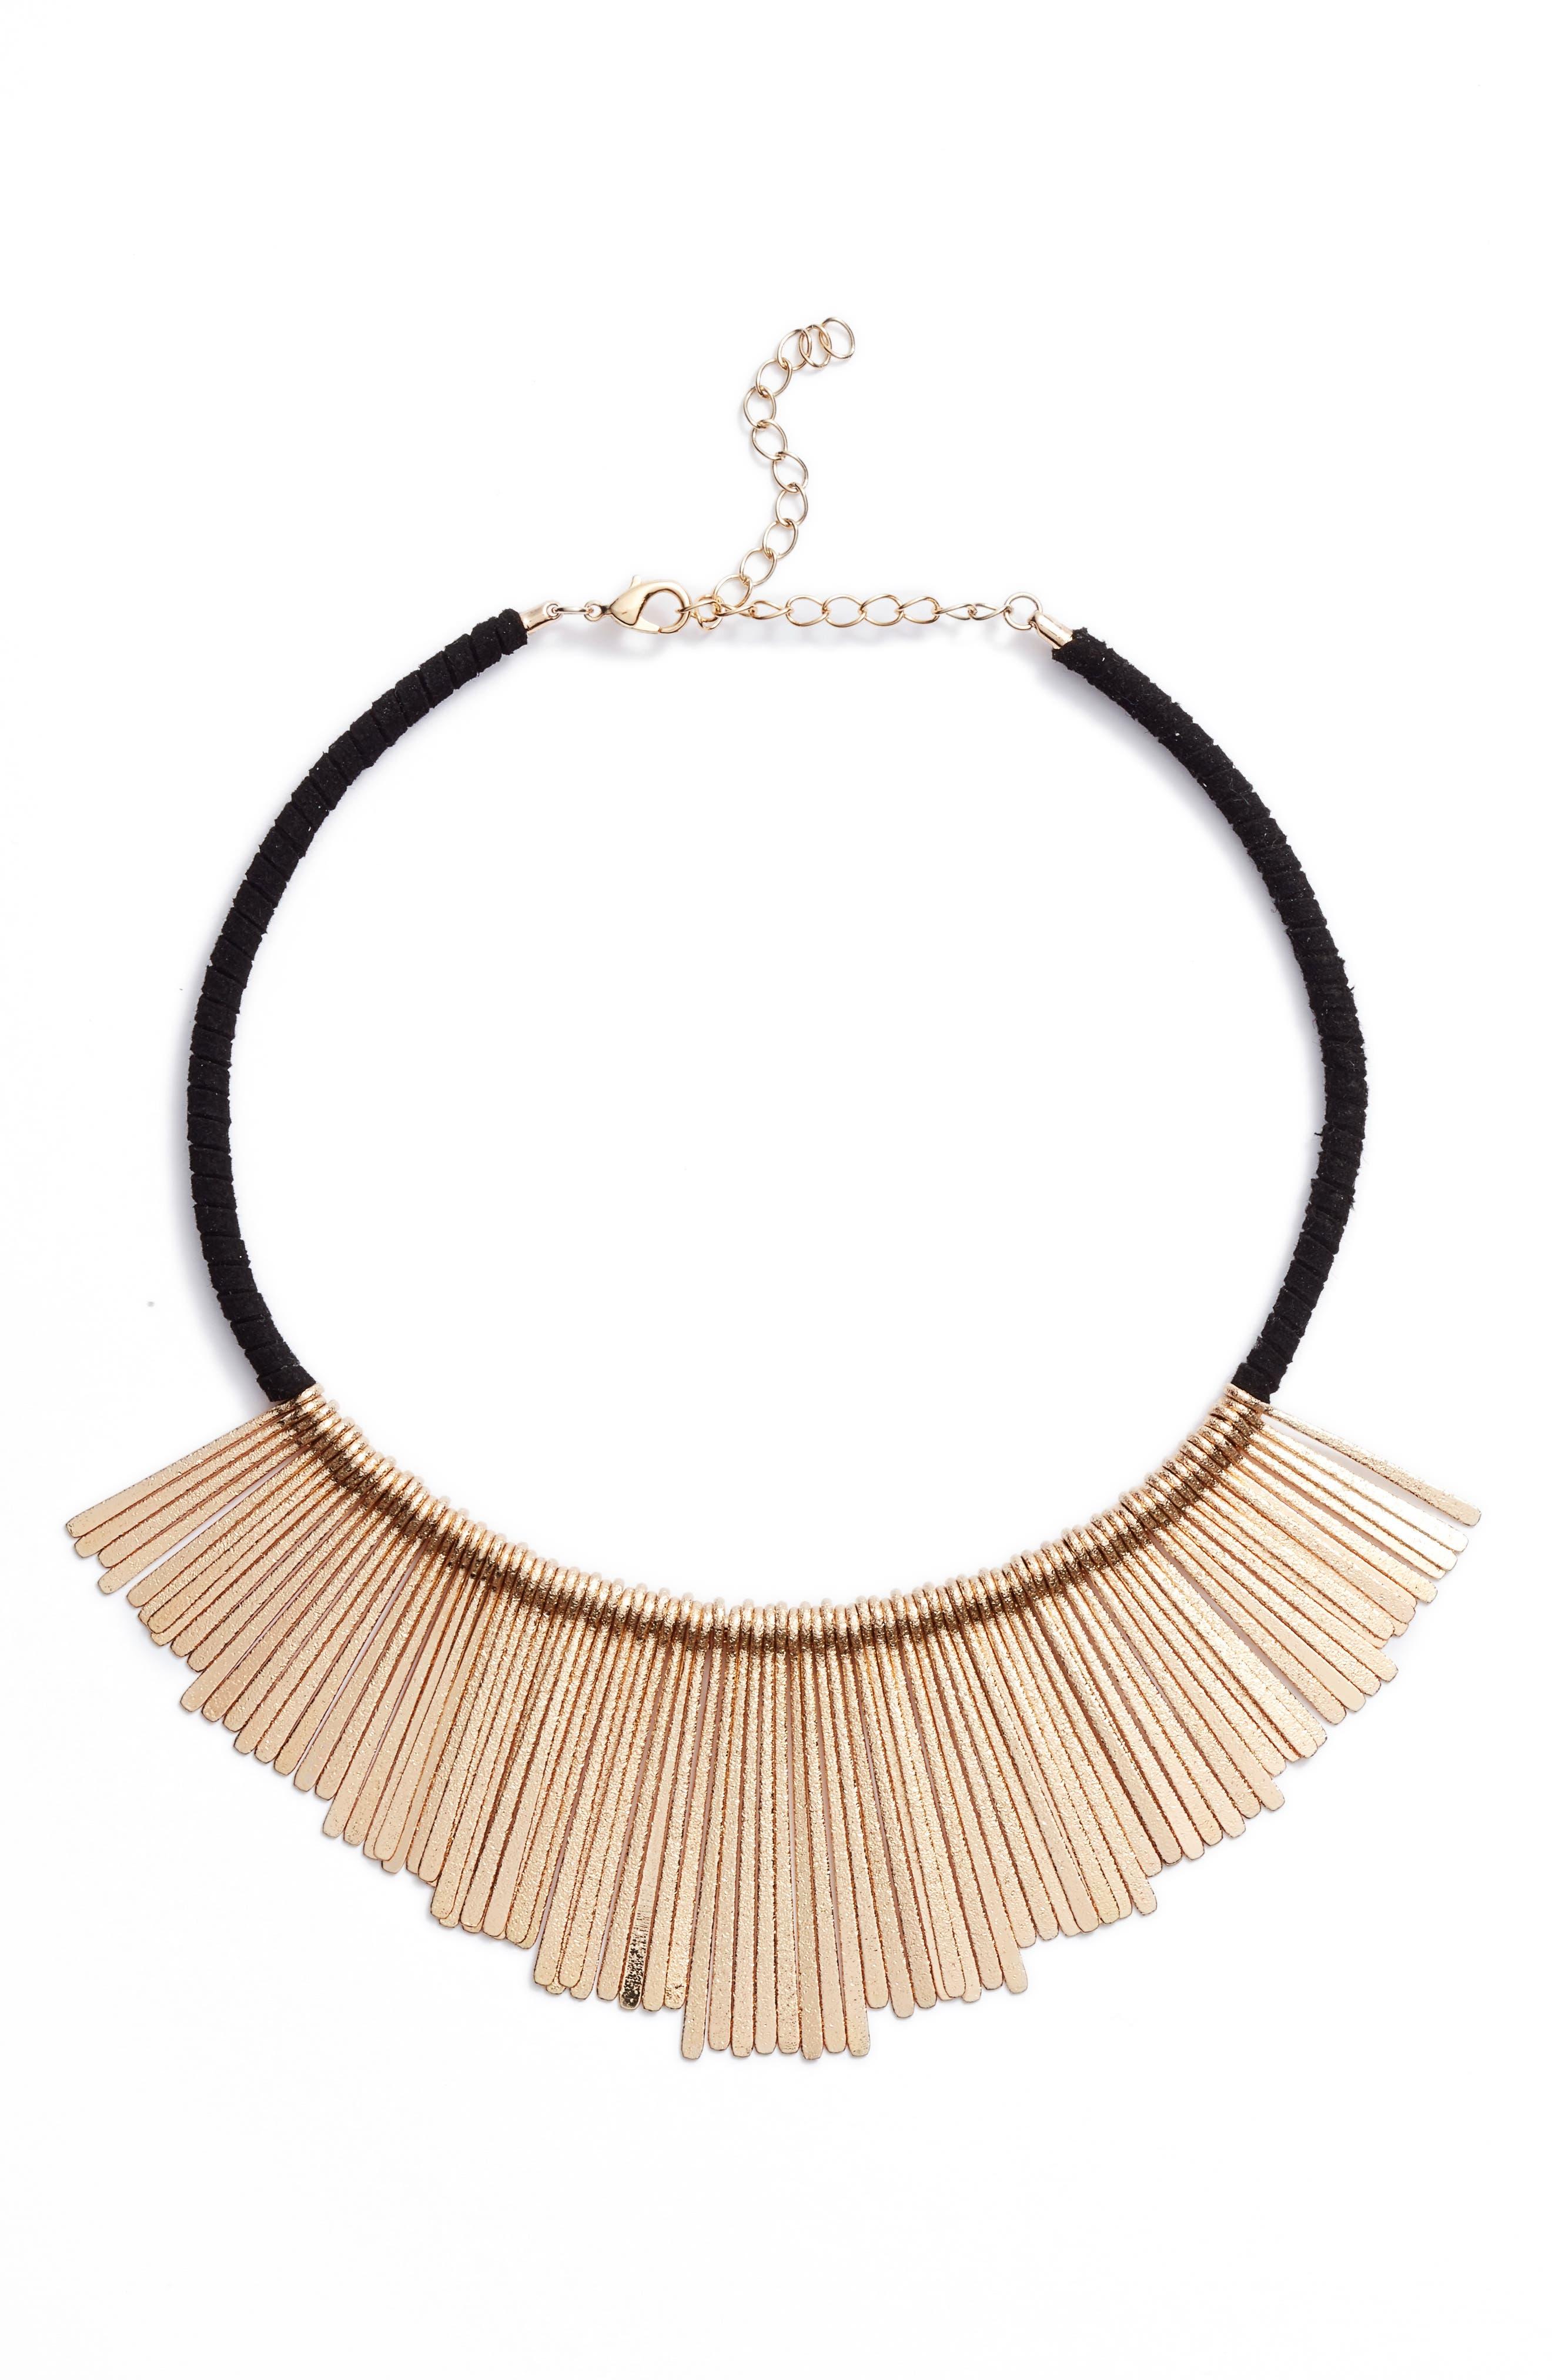 Panacea Bar Charm Bib Necklace